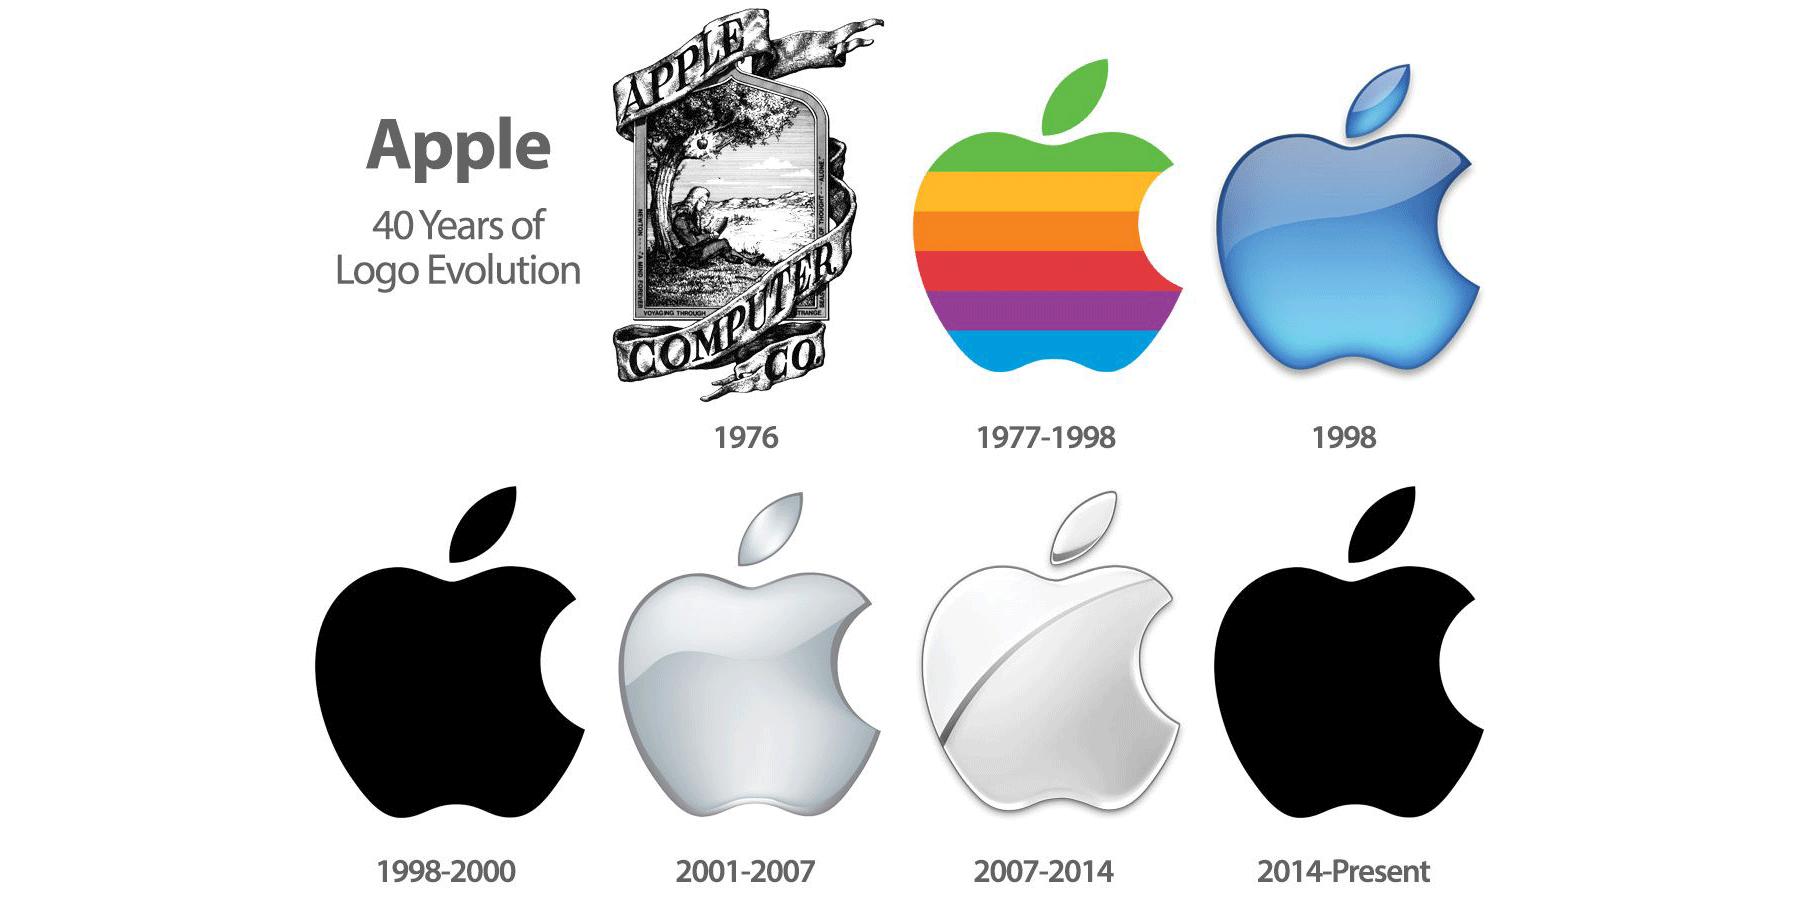 تغییرات لوگو اپل